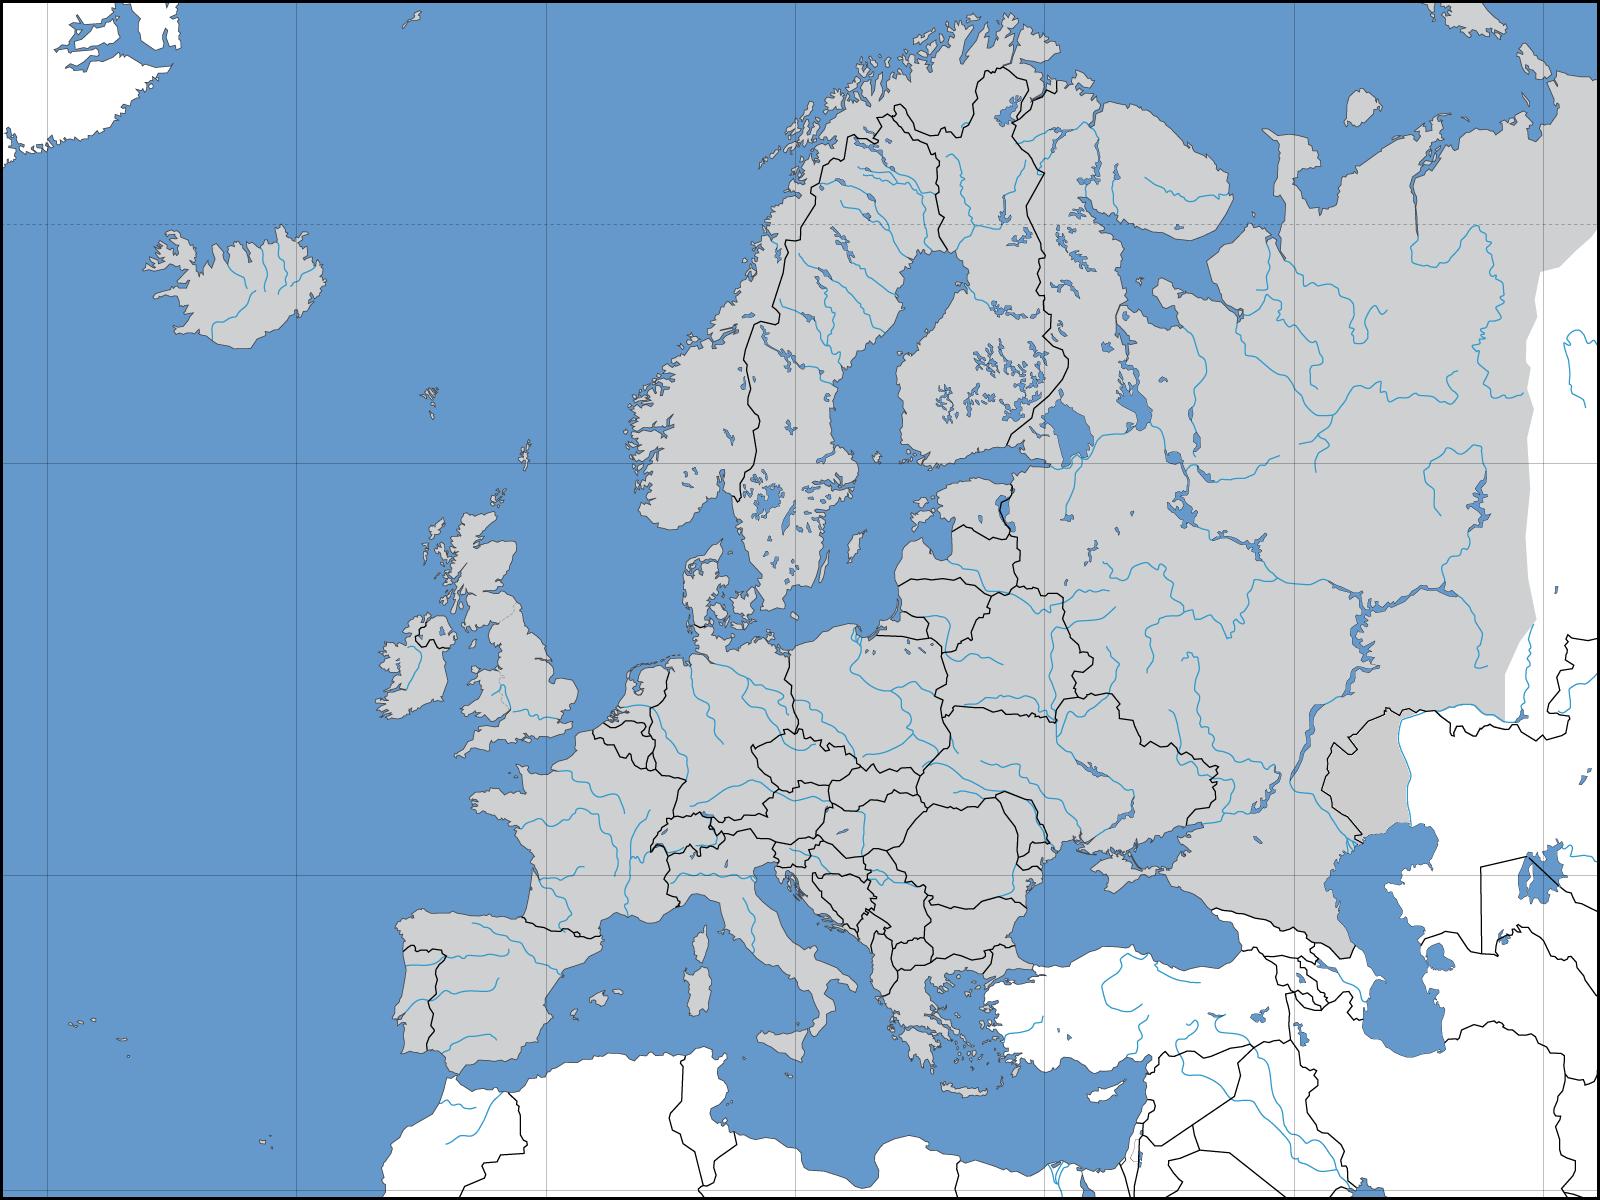 Mapa político mudo de europa